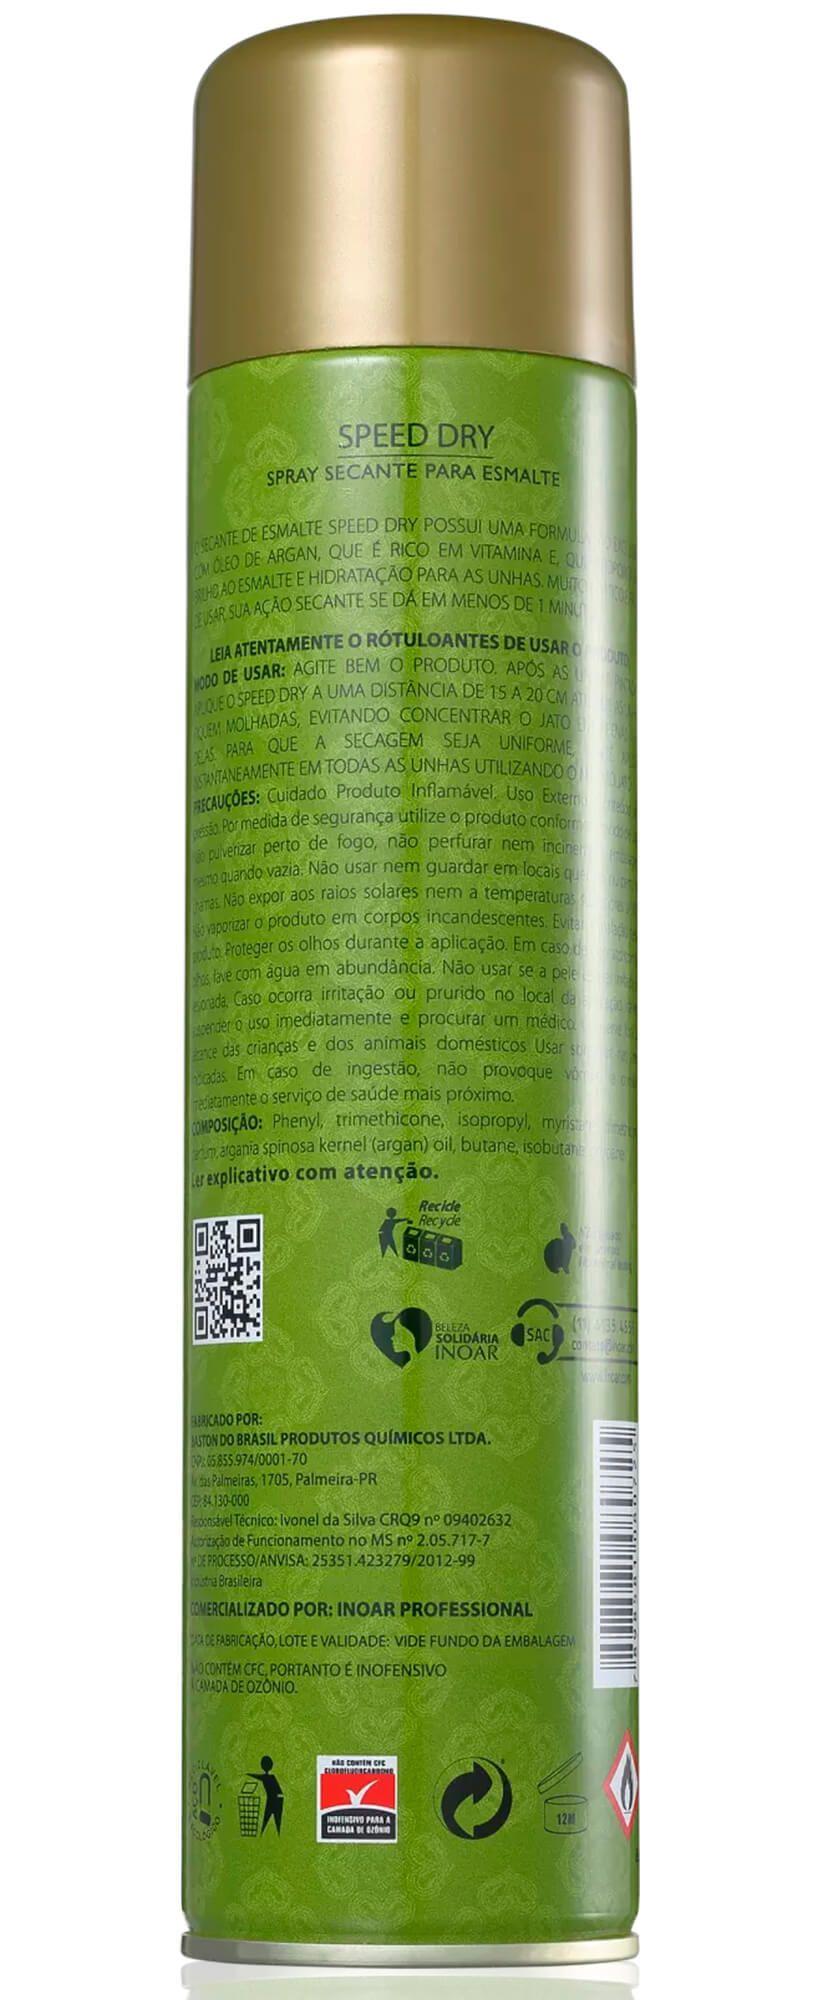 Spray Secante Para Esmalte Speed Dry 400ml